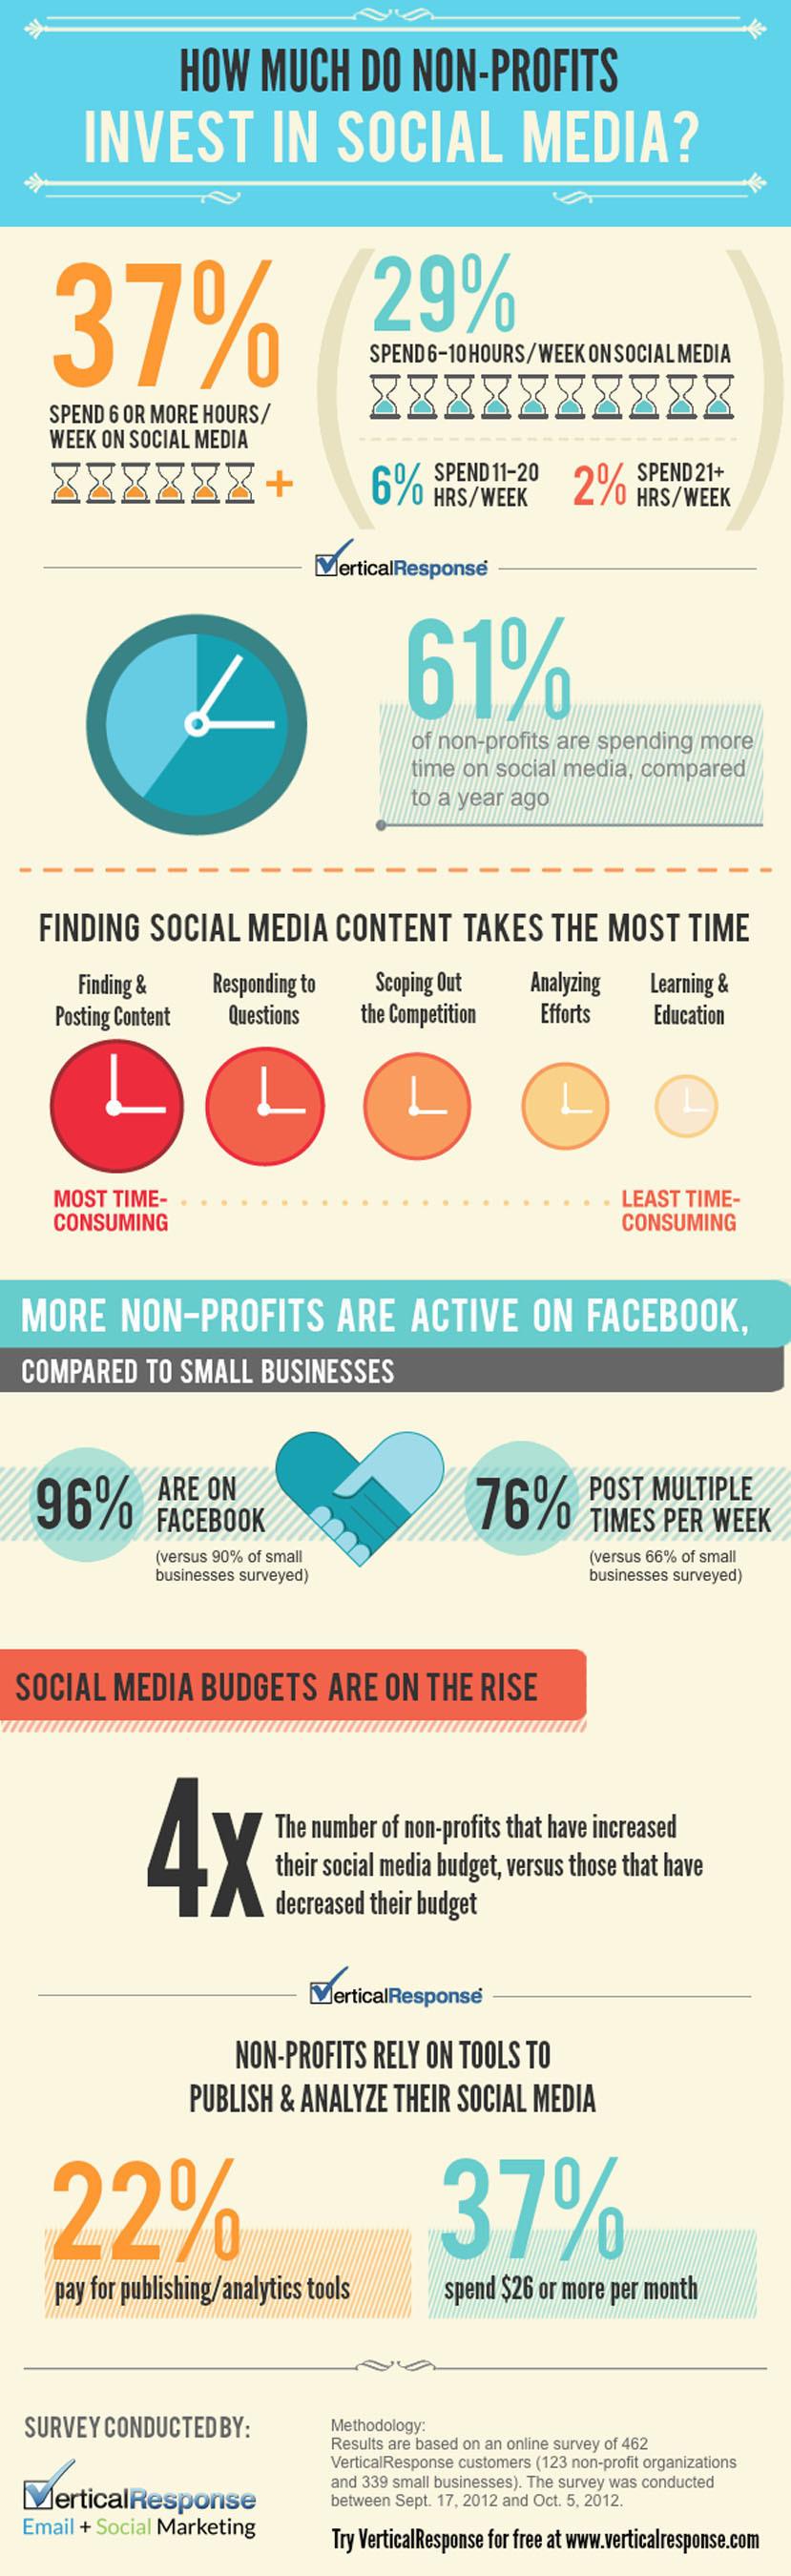 Non-Profits Investing More In Social Media, Says VerticalResponse Survey